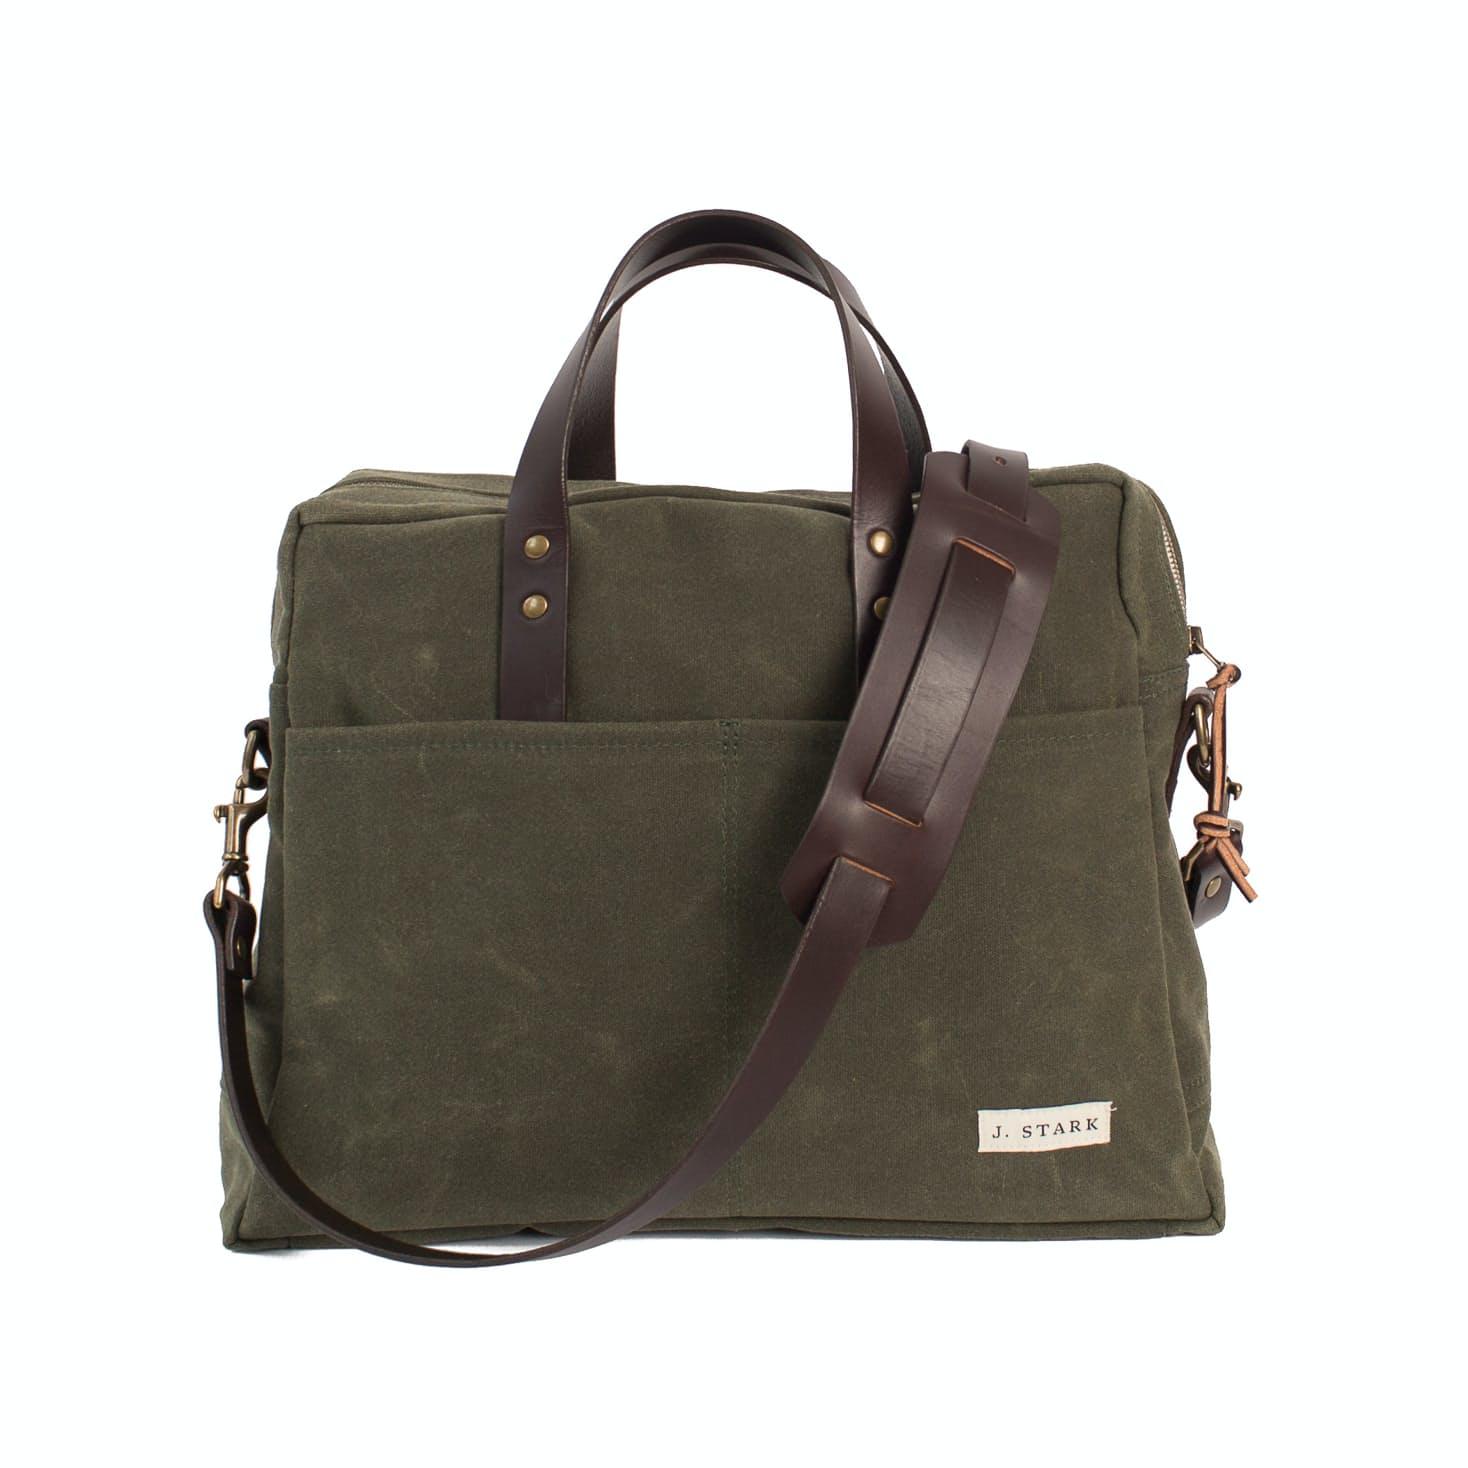 Z6c7bmtxst j stark prospect briefcase 0 original